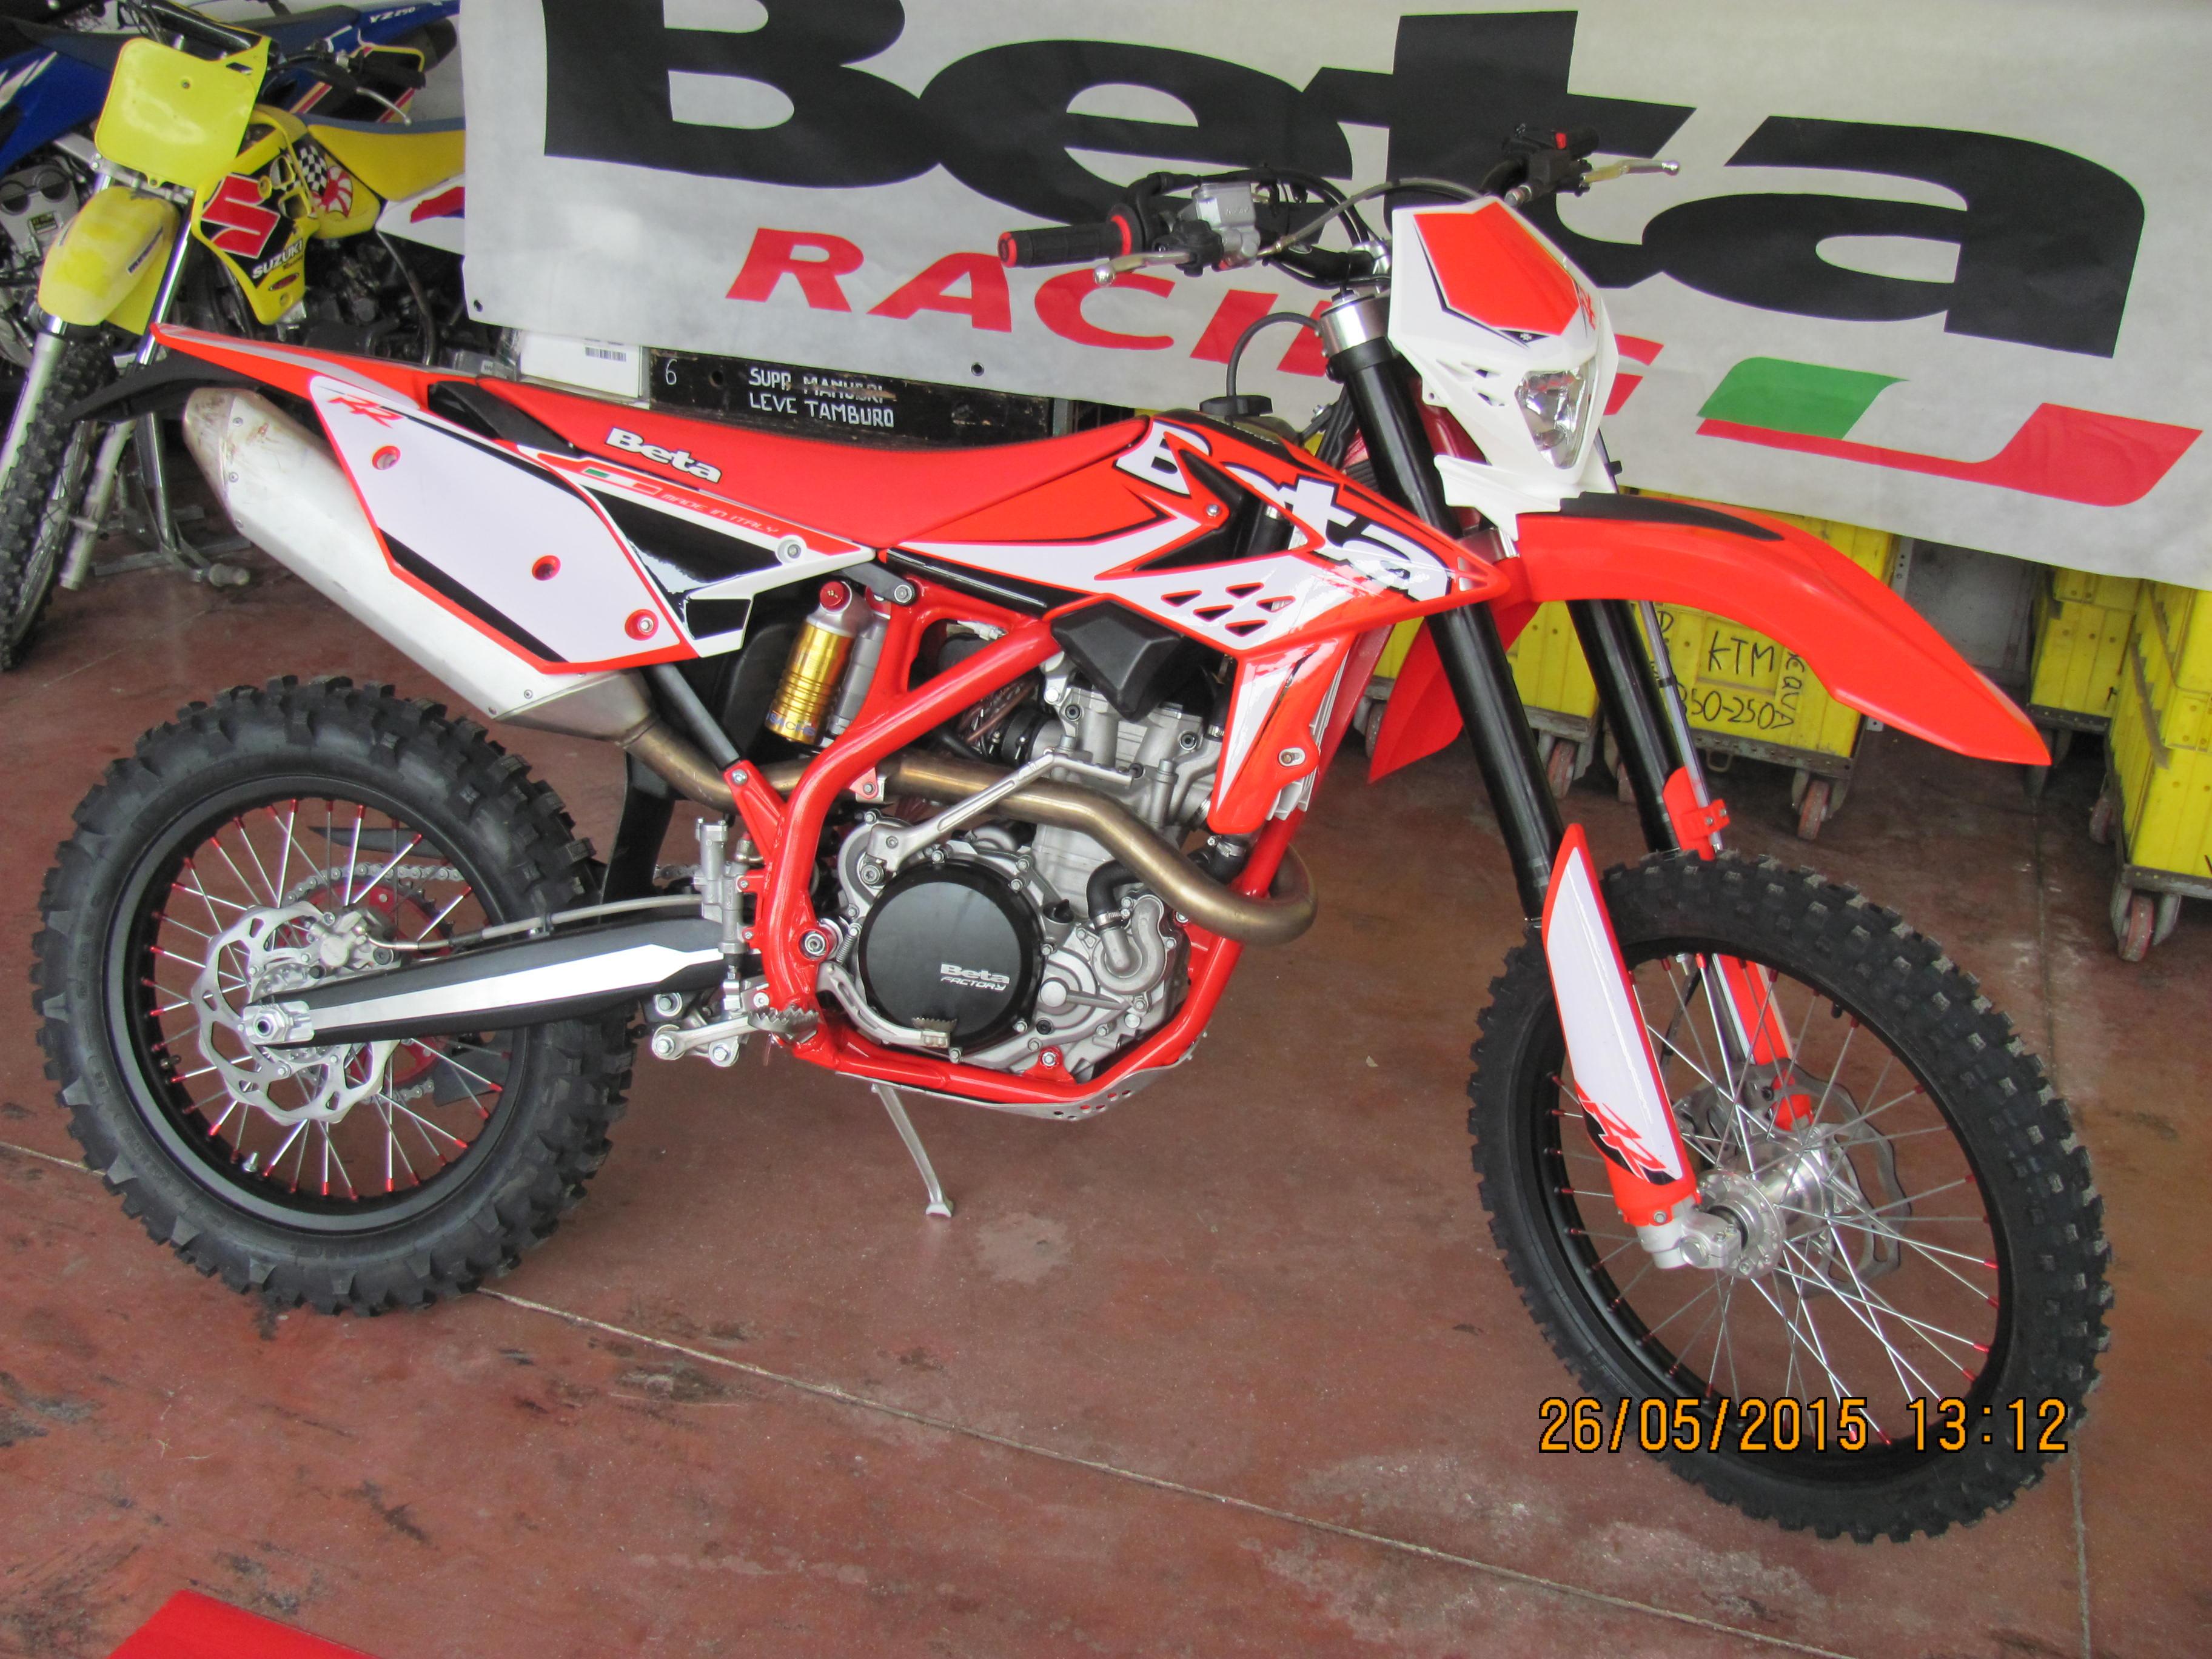 BETA RR 400 cc USATA